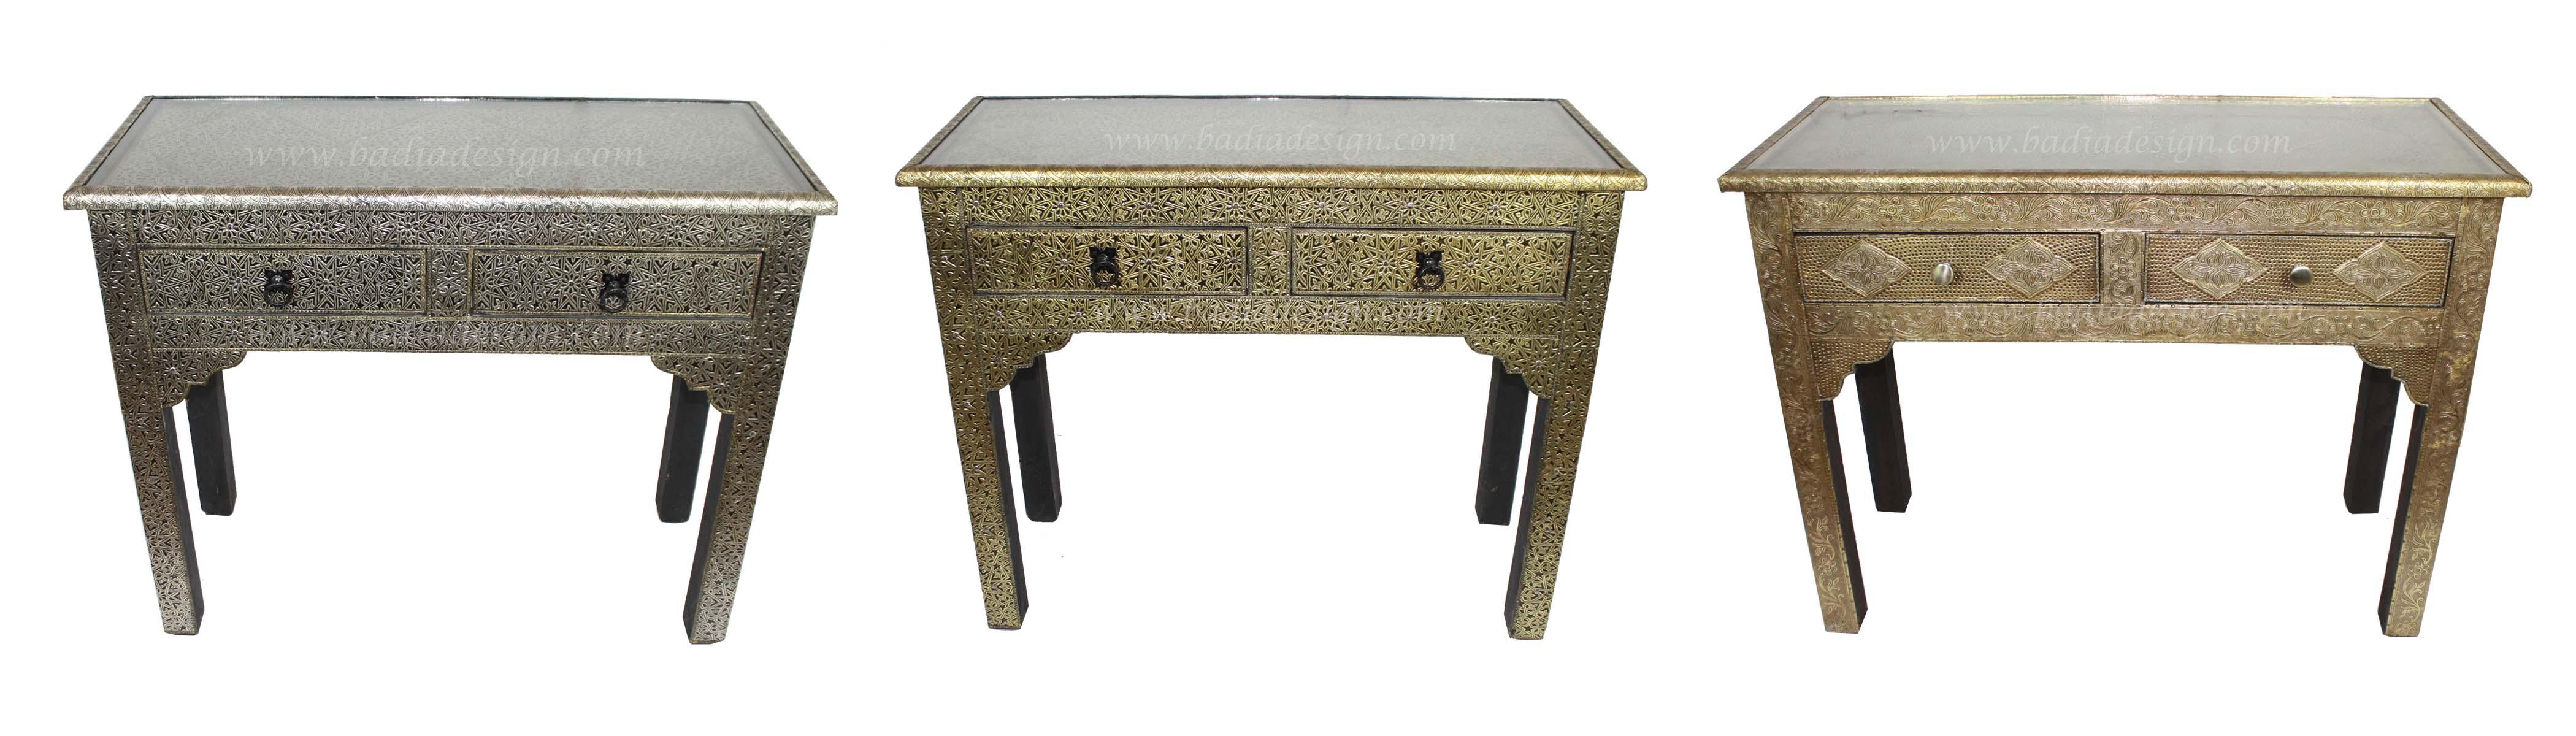 moroccan-buffet-table-nk-ca043.jpg